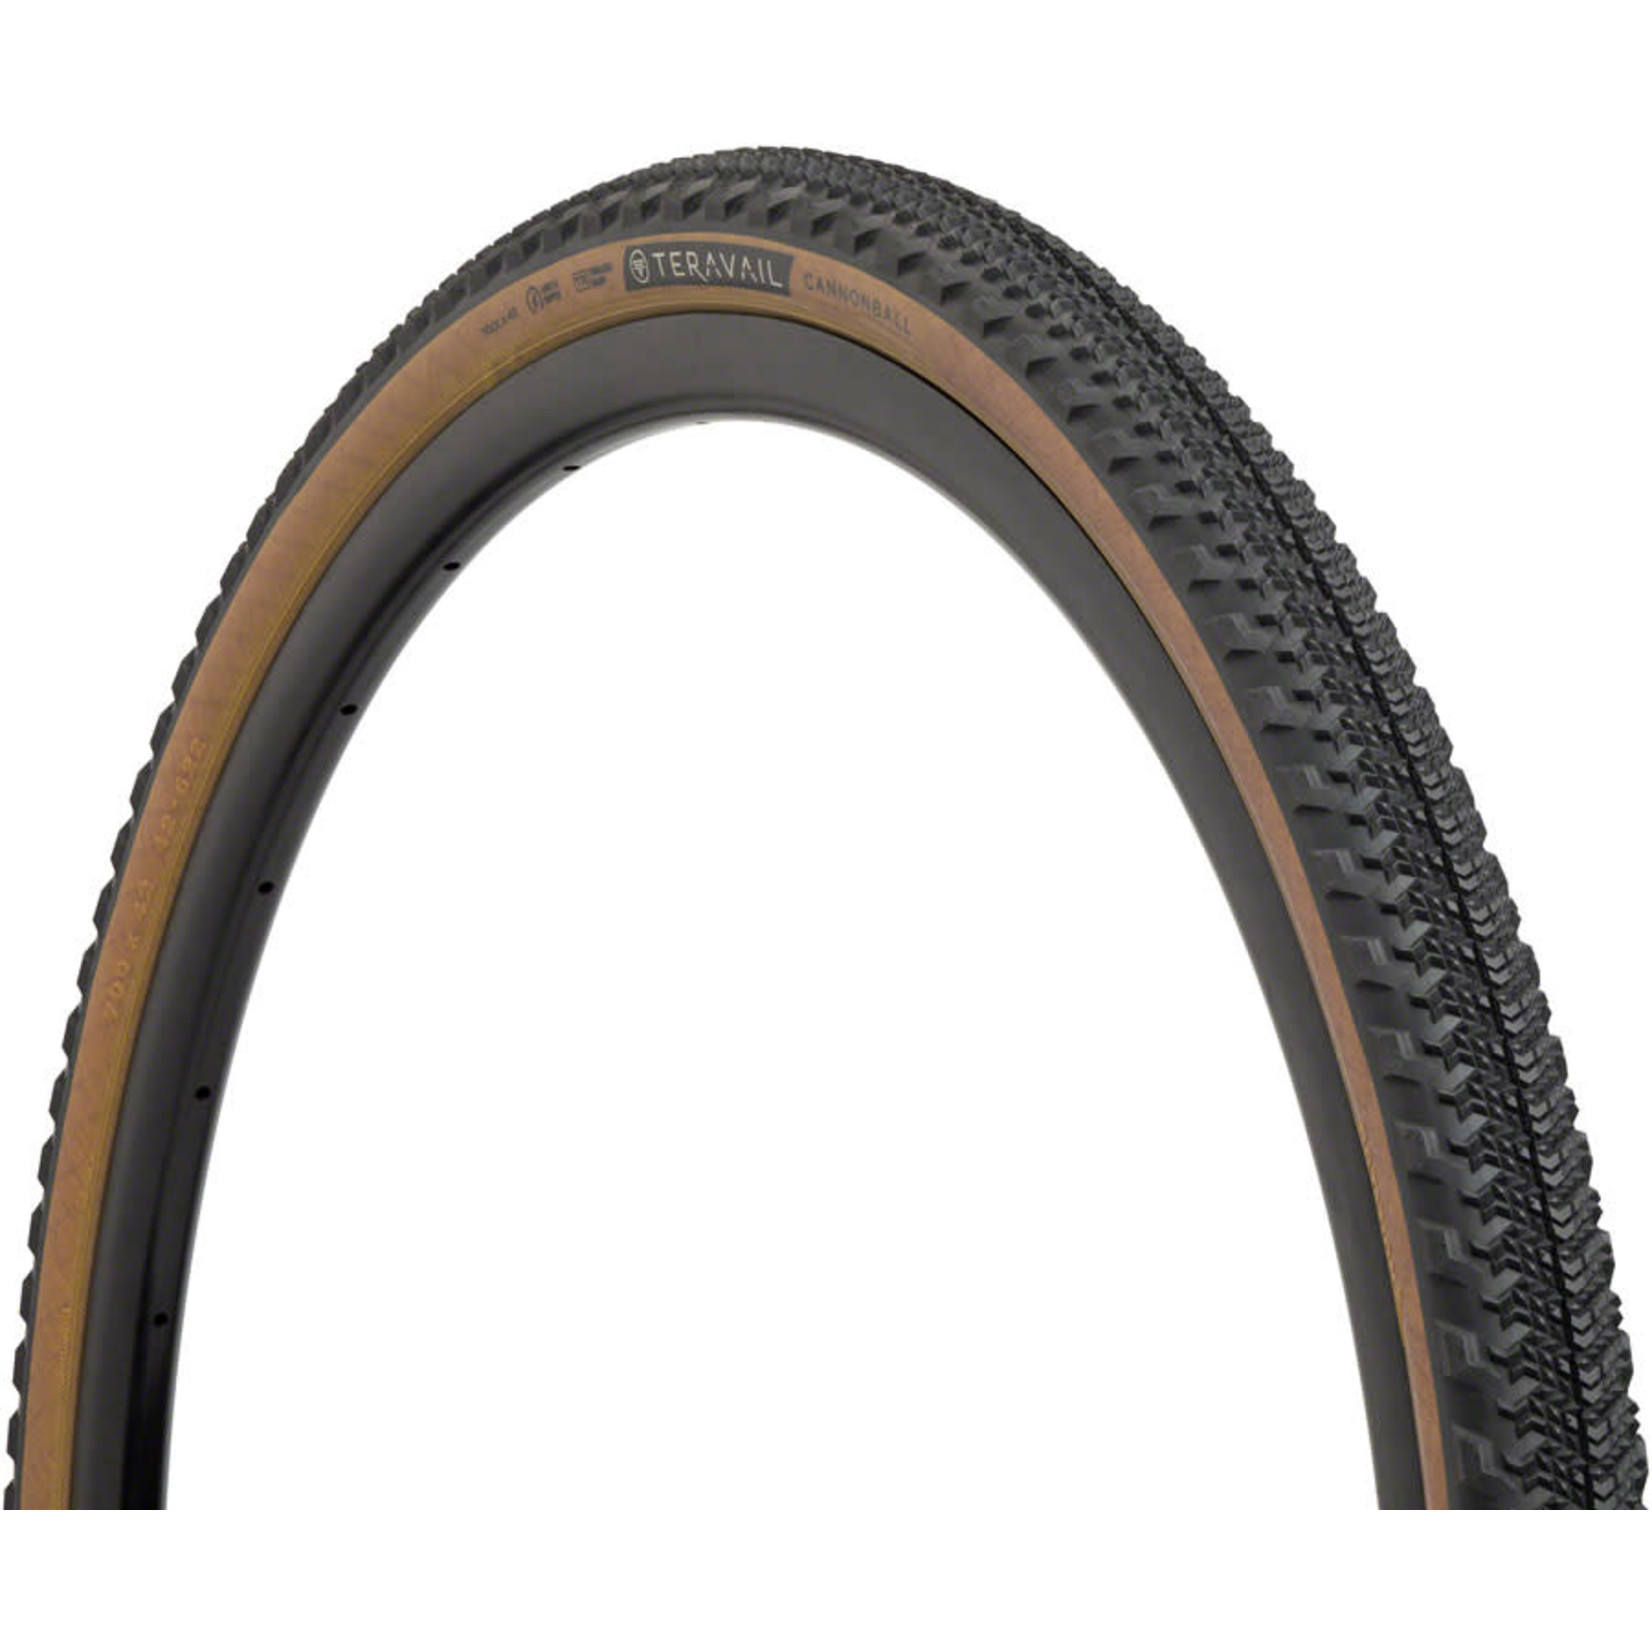 Teravail Teravail Cannonball Tire - 700 x 42, Tubeless, Folding, Tan, Light and Supple